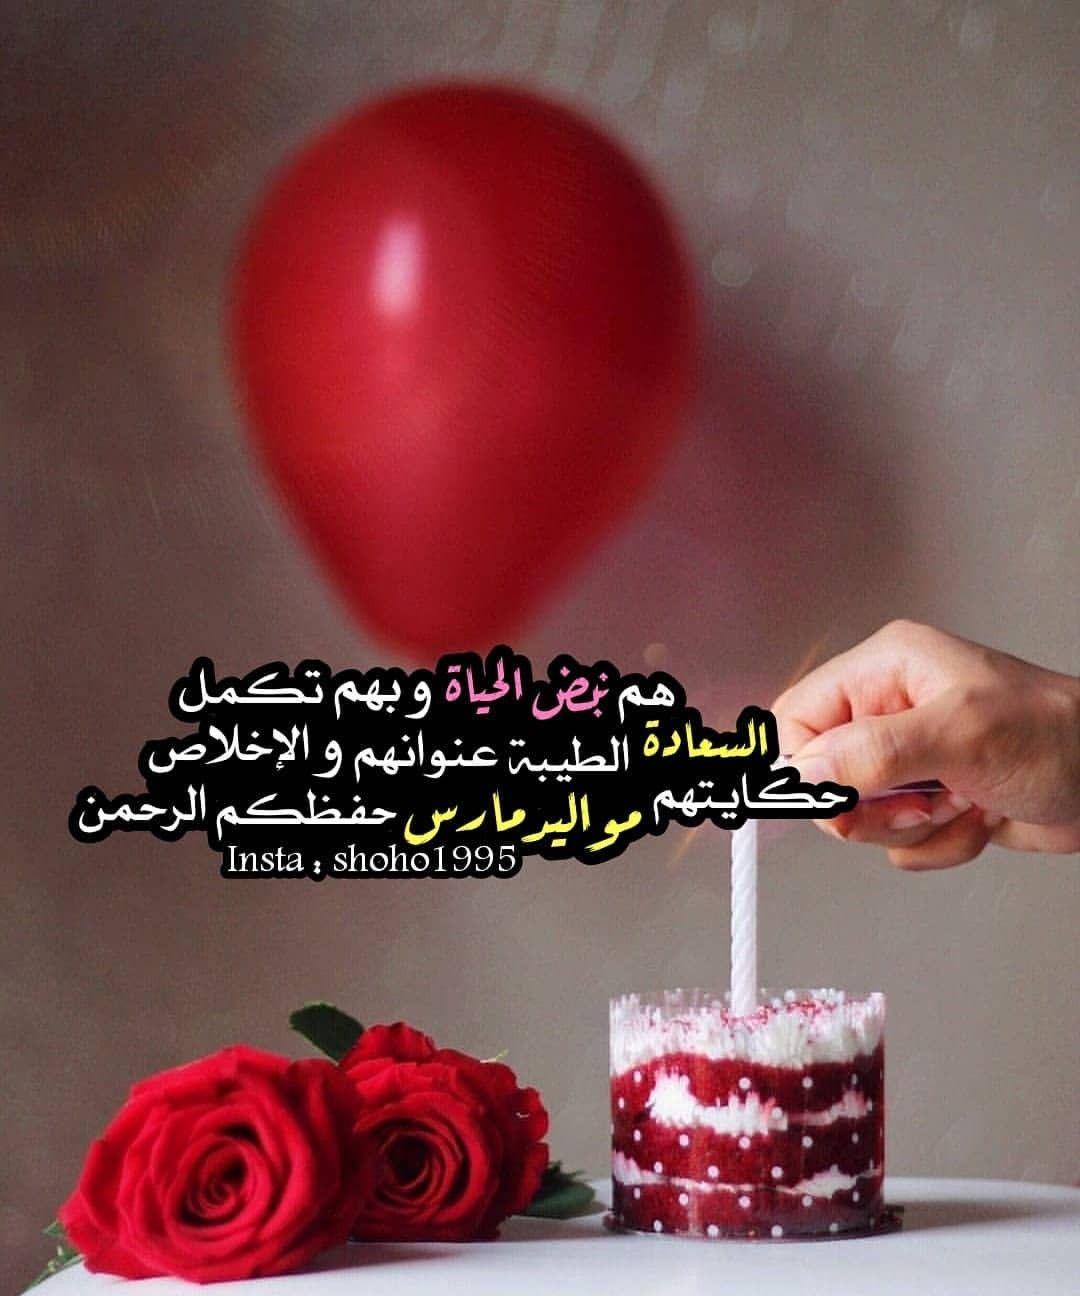 Pin By Nooran On رمزيات Happy Birthday Wishes Cards Birthday Qoutes Birthday Wishes Cards